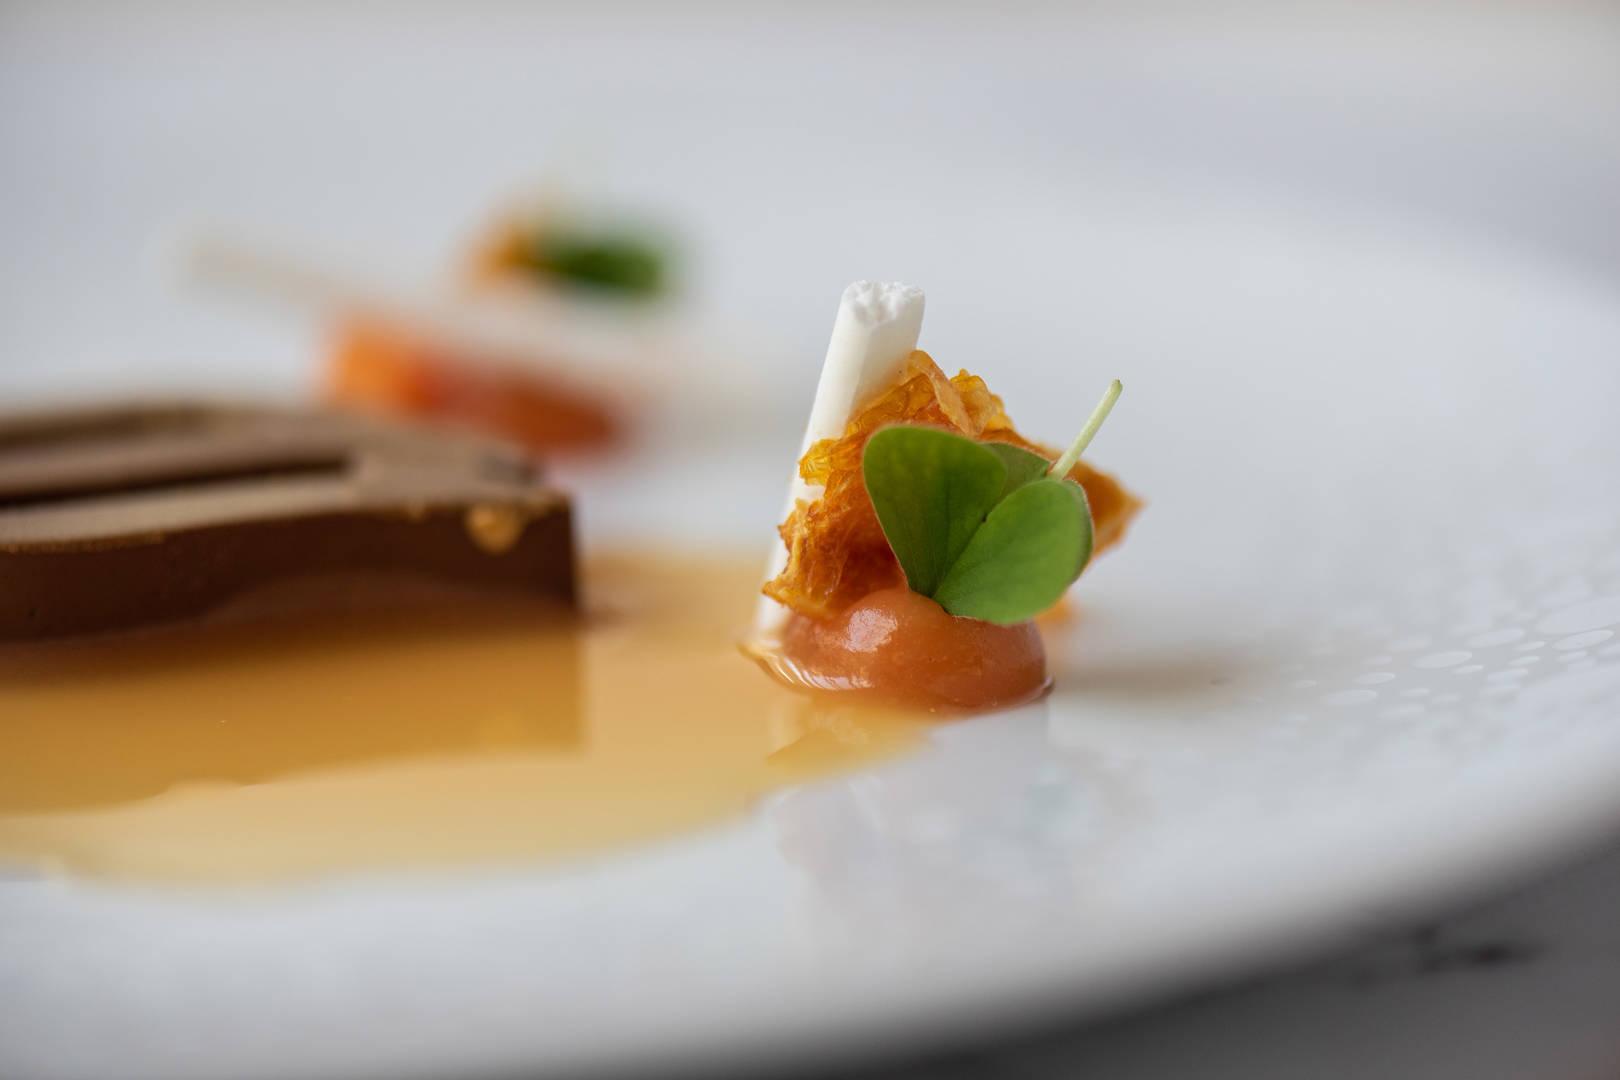 https://cdn.jumeirah.com/-/mediadh/DH/Hospitality/Jumeirah/Restaurants/Frankfurt/Frankfurt-Max-On-One-Grill-Room/Restaurant-Gallery/Jumeirah-Frankfurt-Beacon-Dessert-5_6-4.jpg?h=1080&w=1620&hash=B6A7EC8A4FC0559D2E62C0305F84A1E9